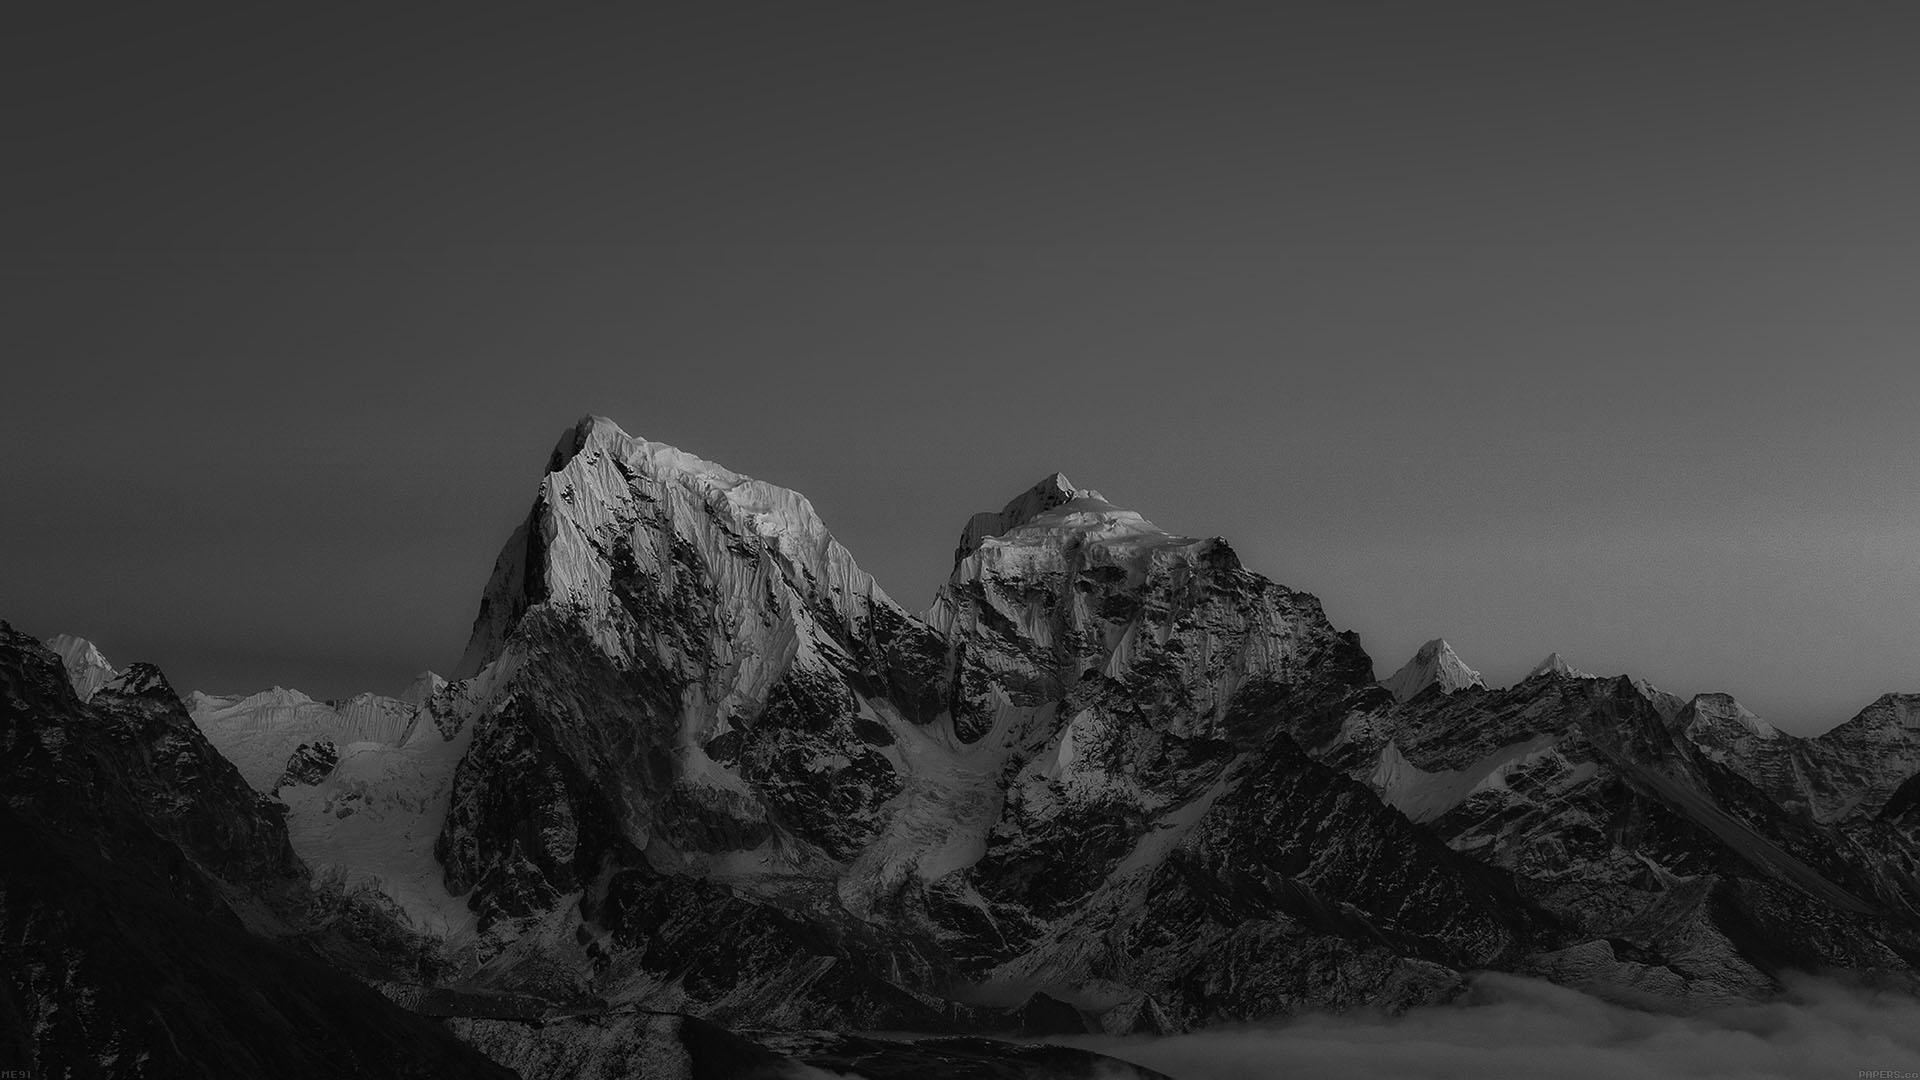 Me91-himalaya-sunset-dark-mountain-art